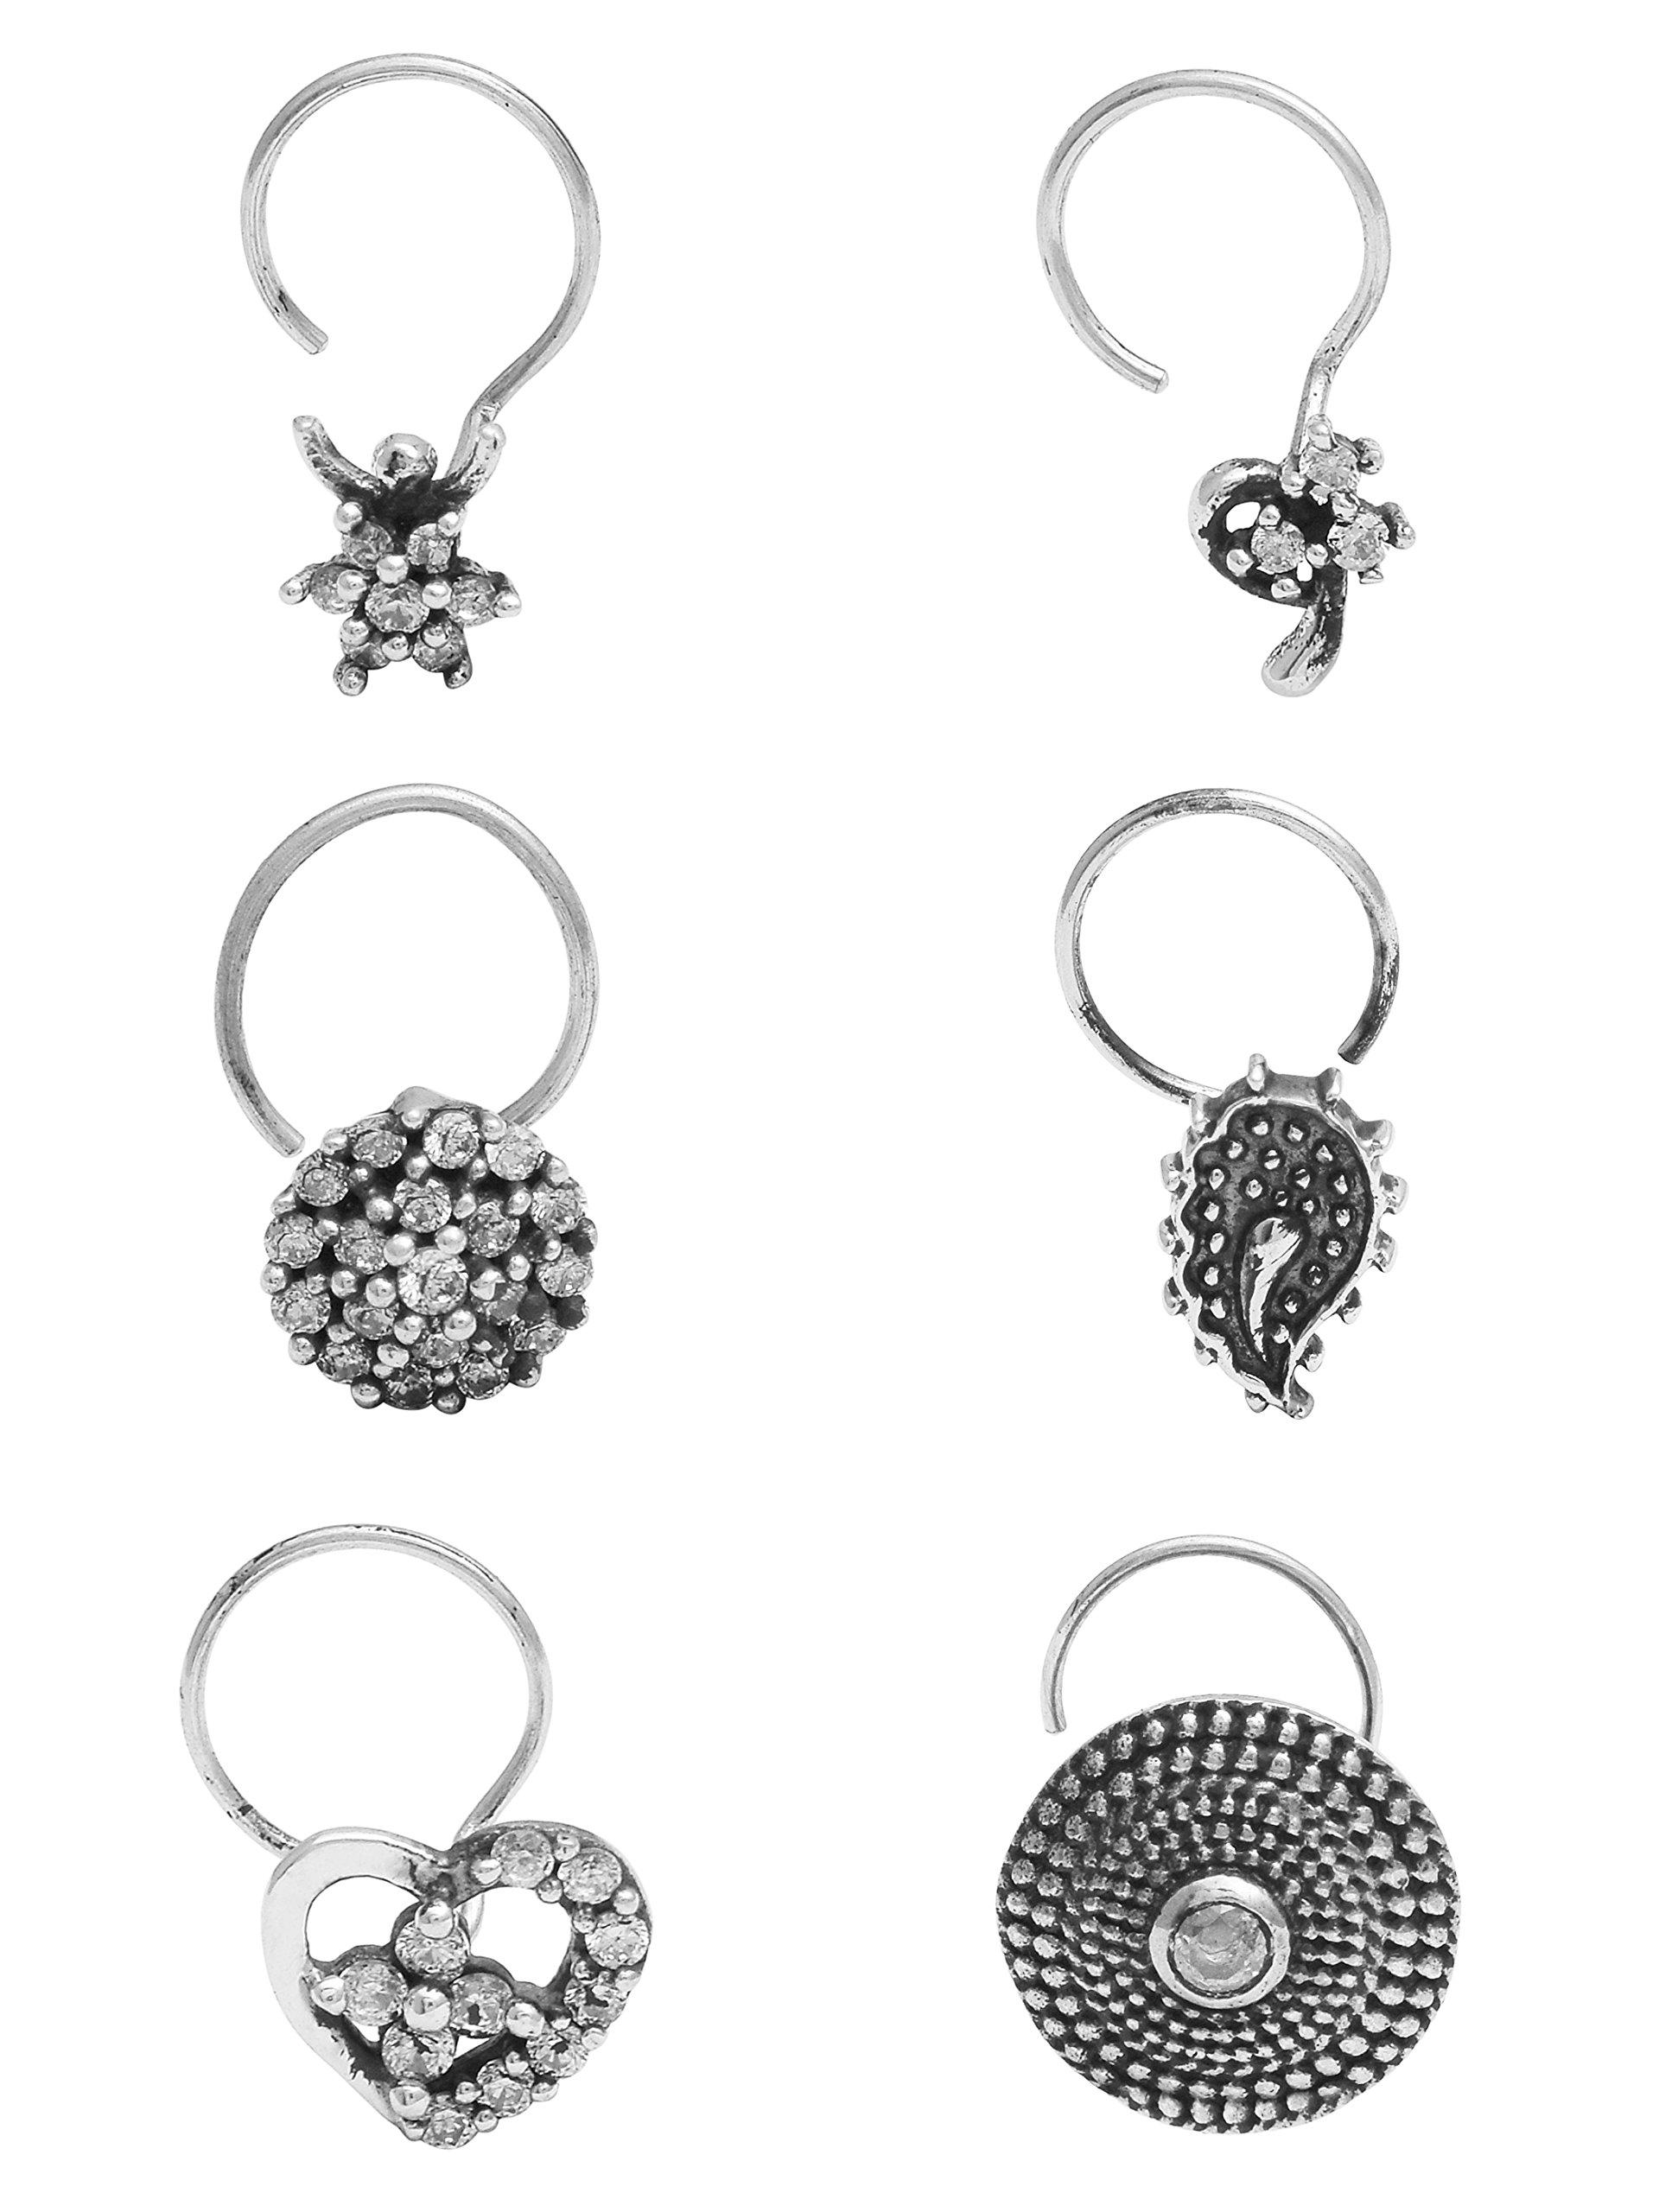 Shine Jewel Bohemian Tribal Oxidized 925 Sterling Silver Nose Pin Cubic Zicronia Set of 8 pcs